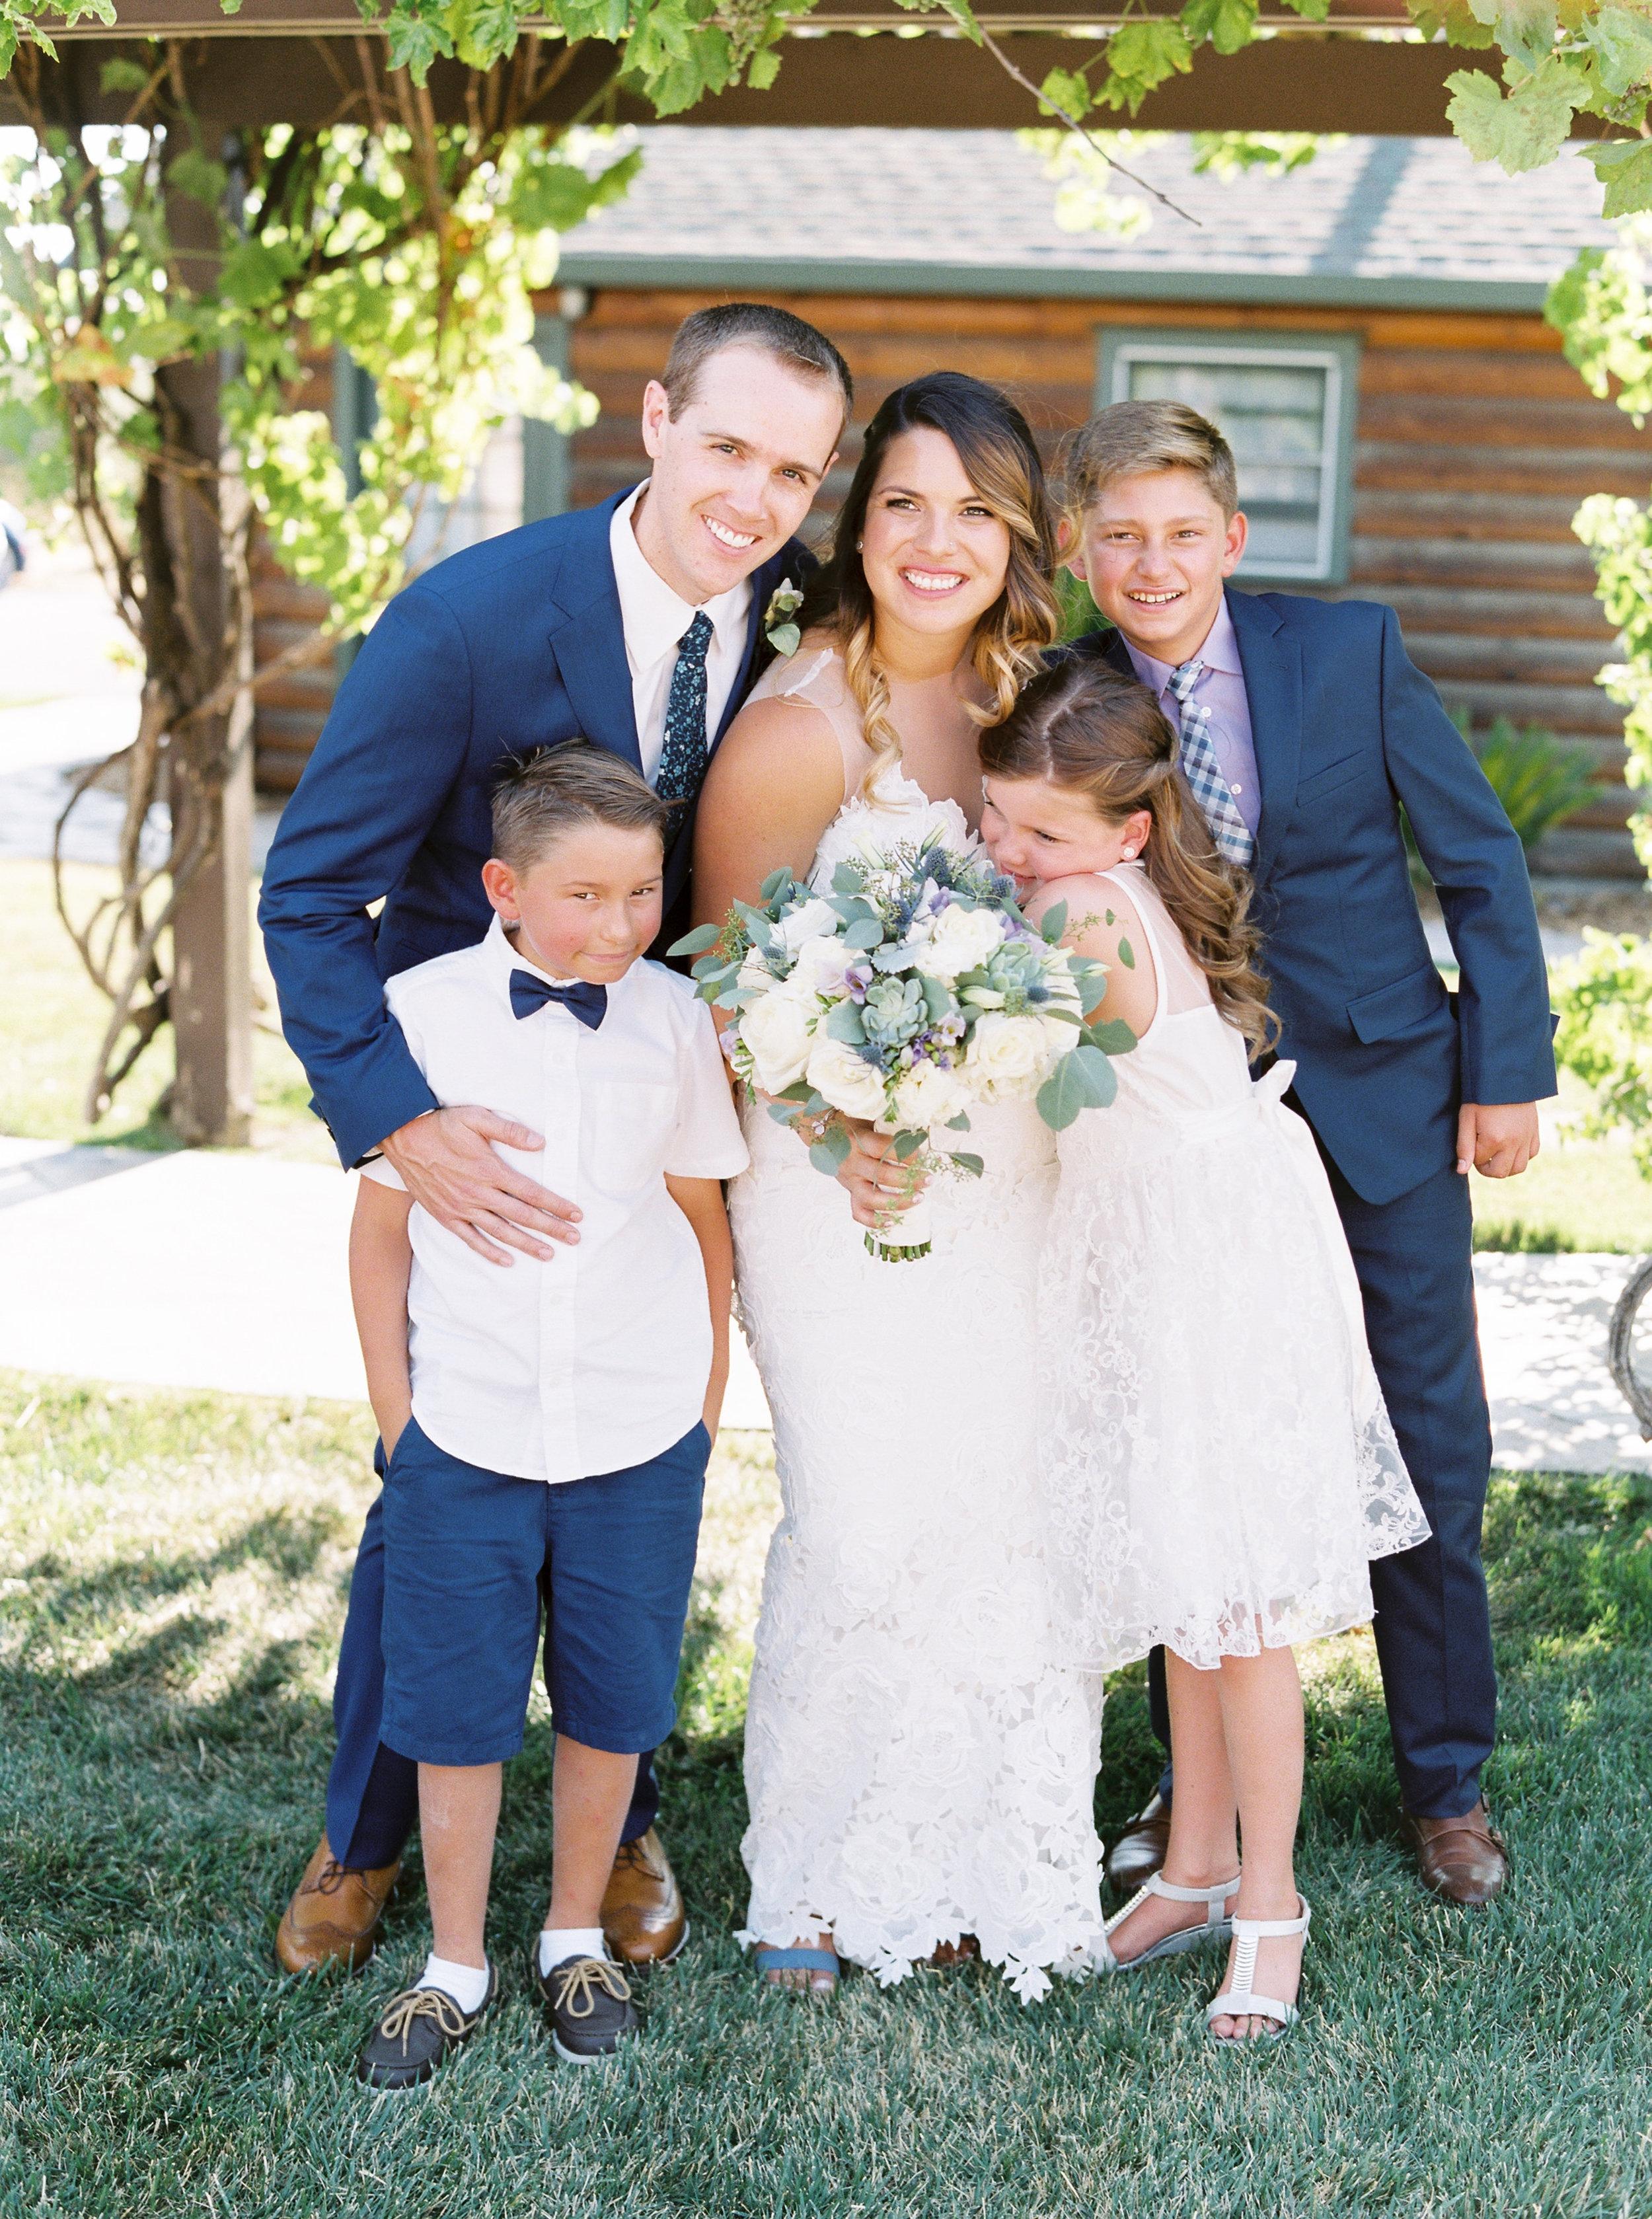 the-purple-orchid-resort-wedding-in-livermore-california-108.jpg